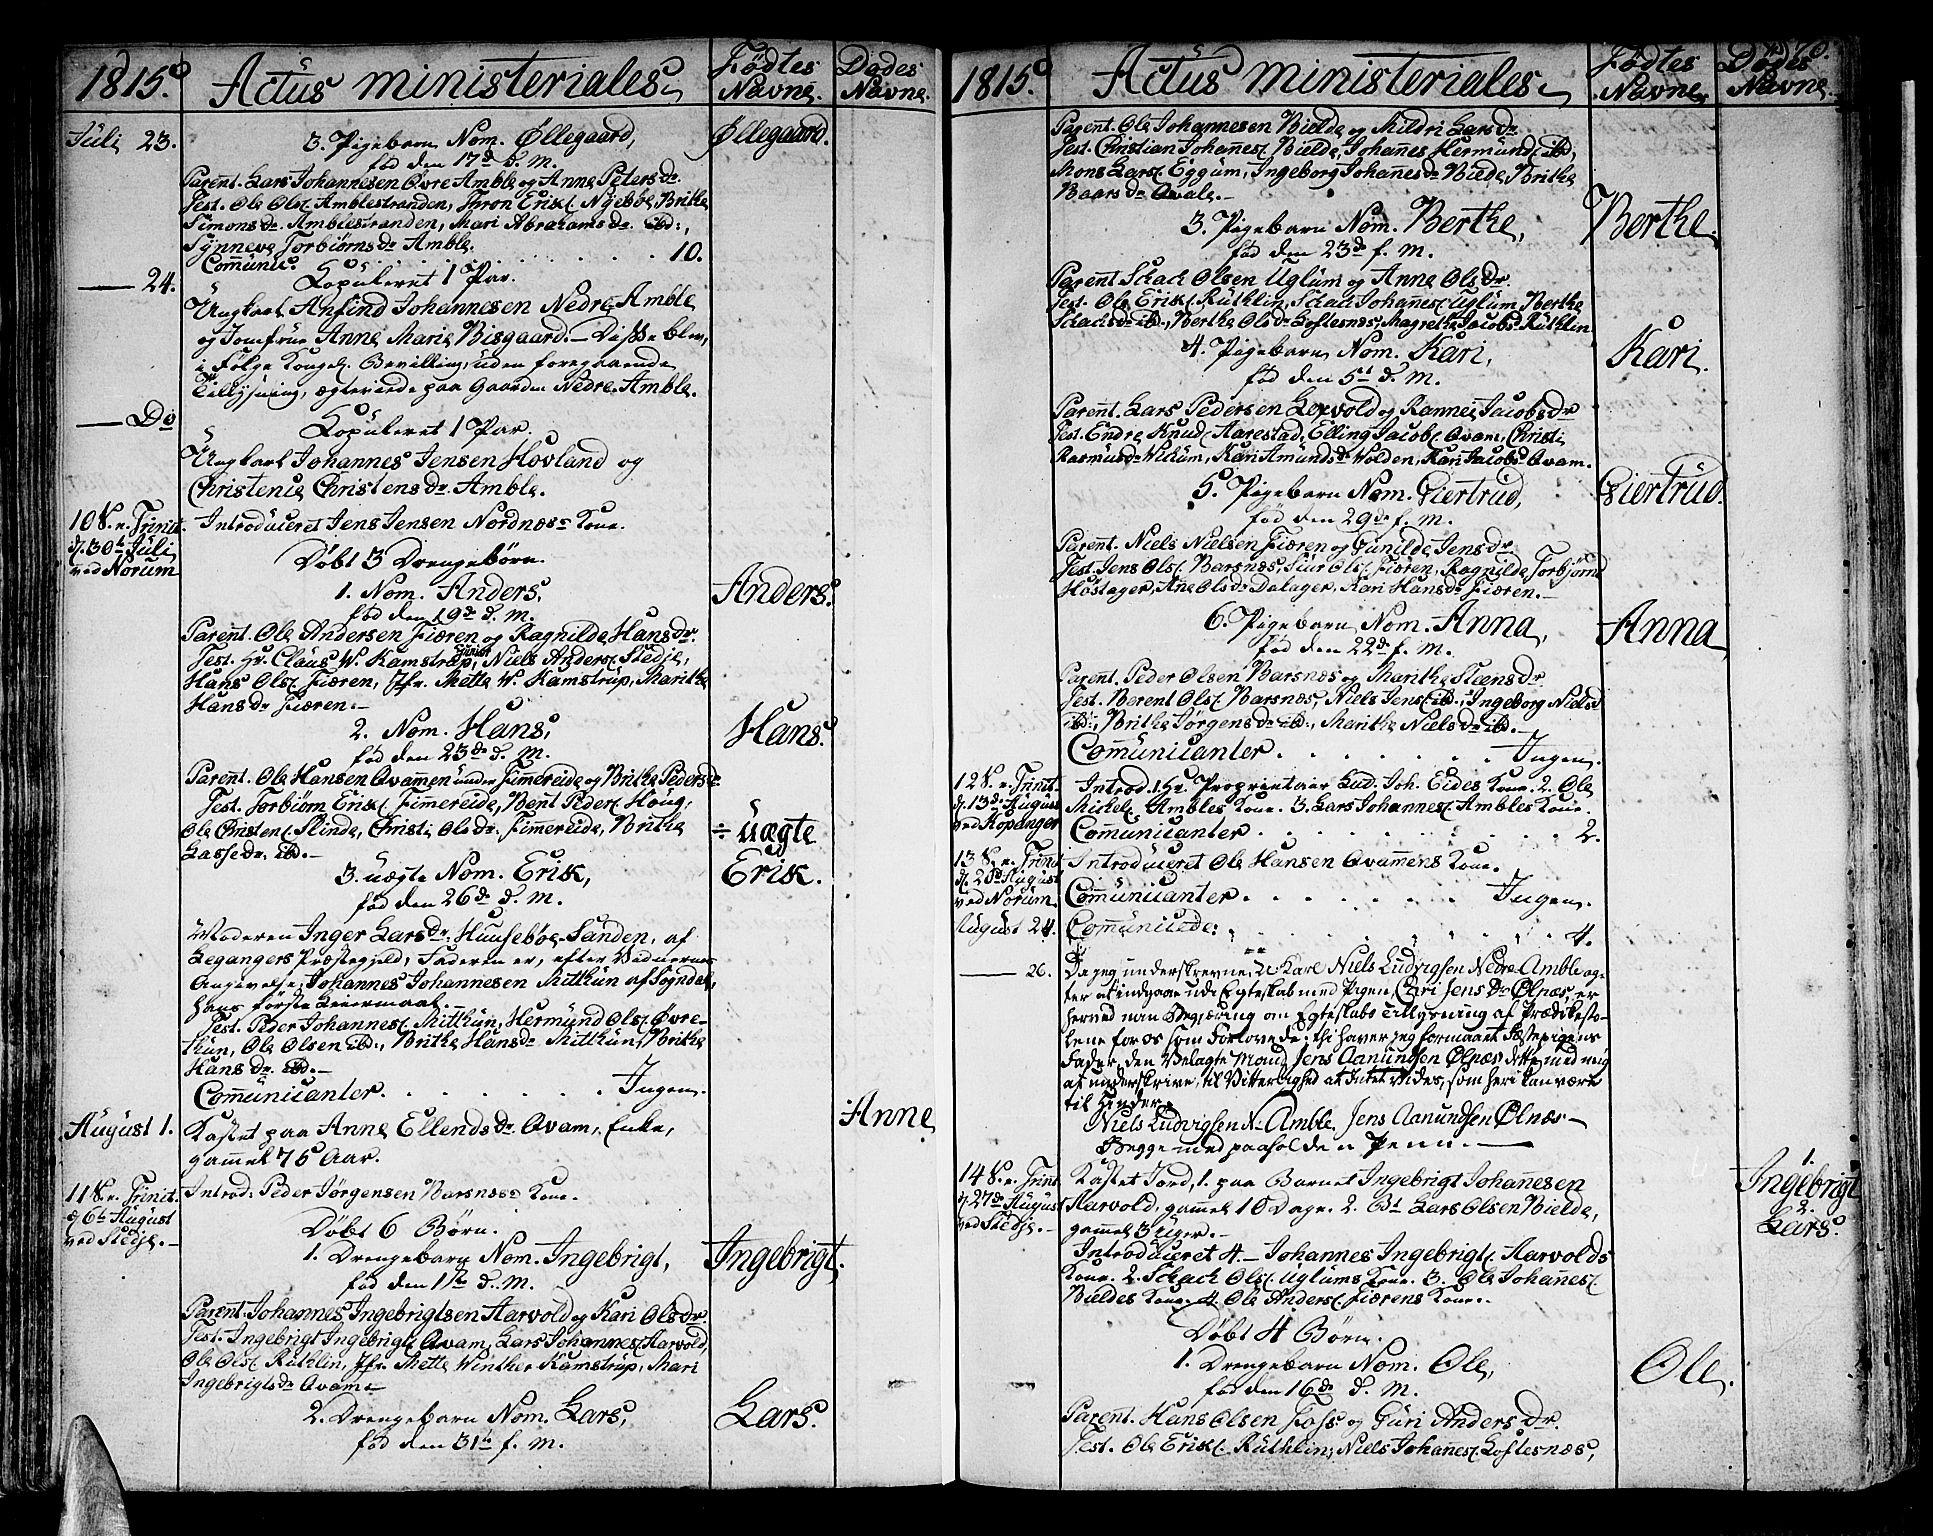 SAB, Sogndal sokneprestembete, H/Haa/Haaa/L0009: Ministerialbok nr. A 9, 1809-1821, s. 70